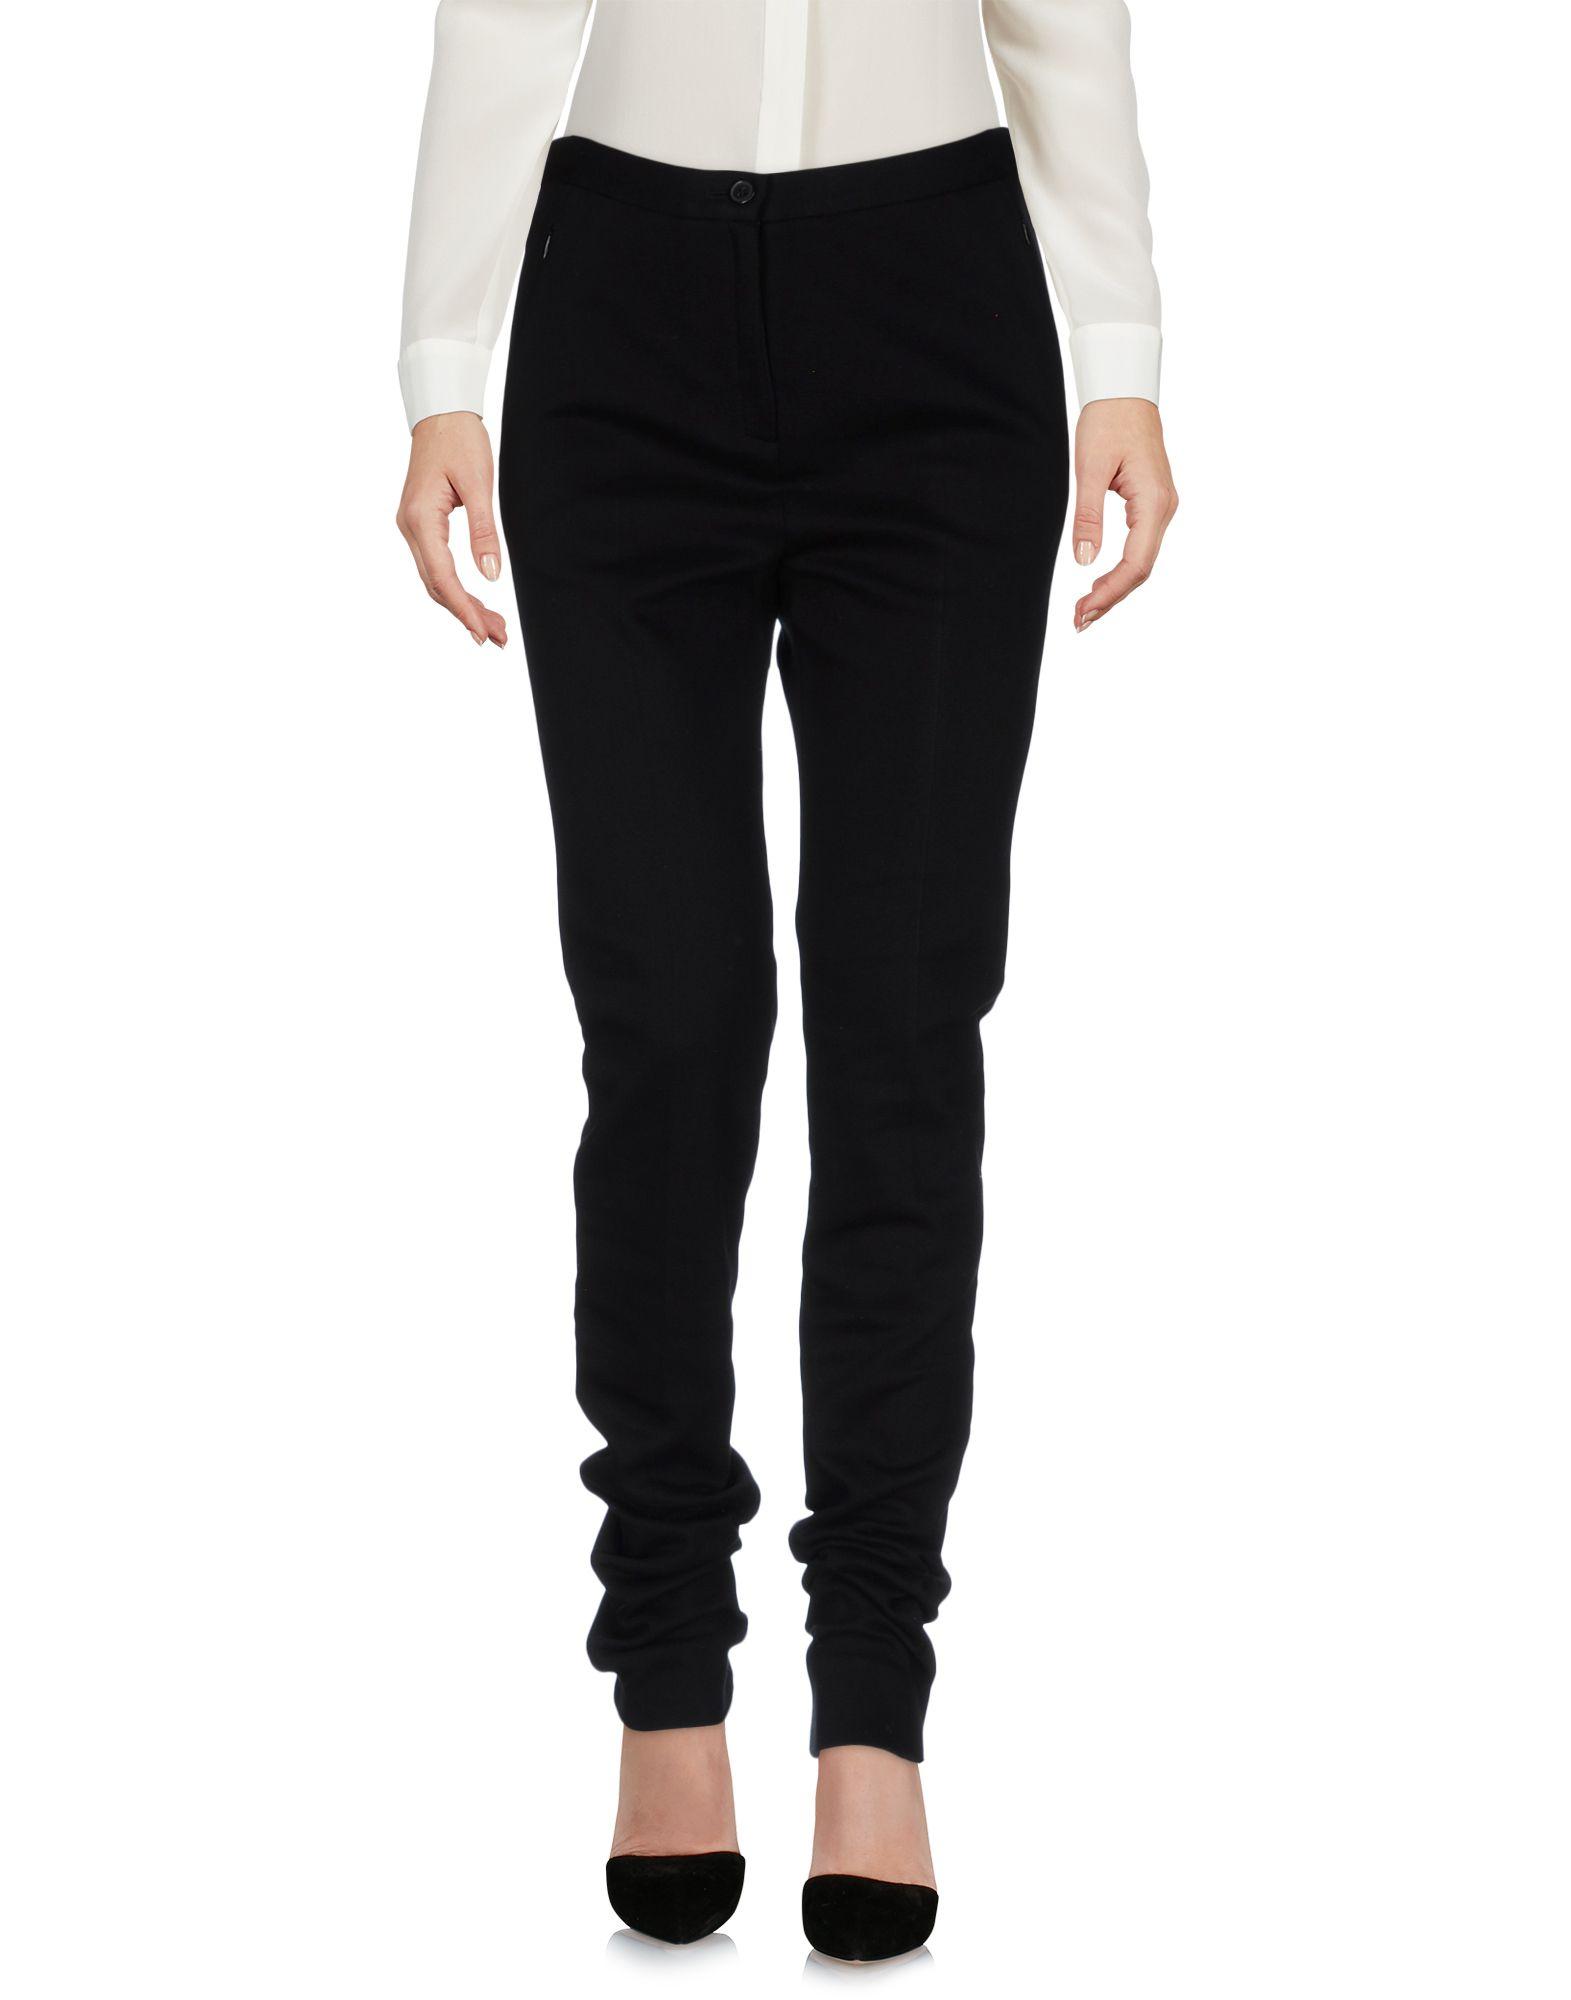 Pantalone Maison Margiela Donna - Acquista online su MpQIxKa2